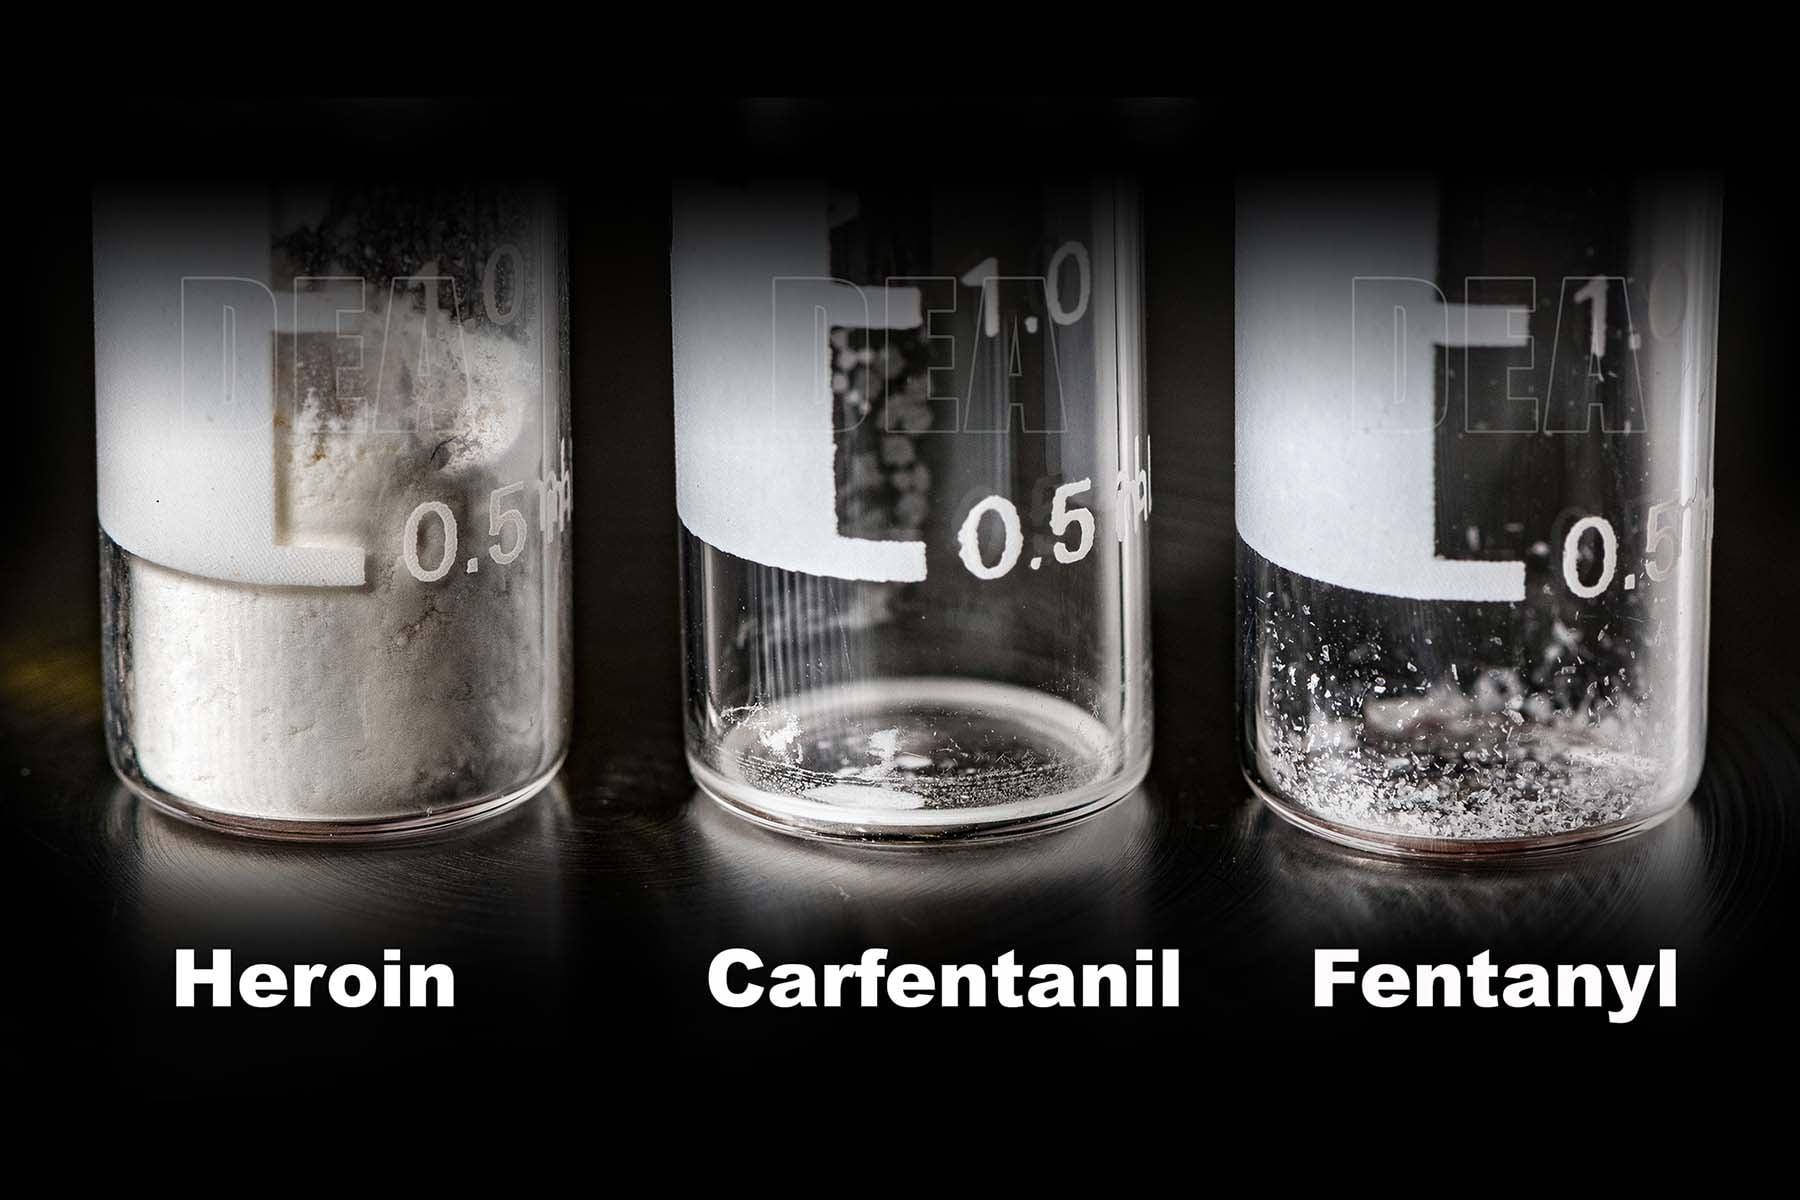 heroin carfentanil fentanyl